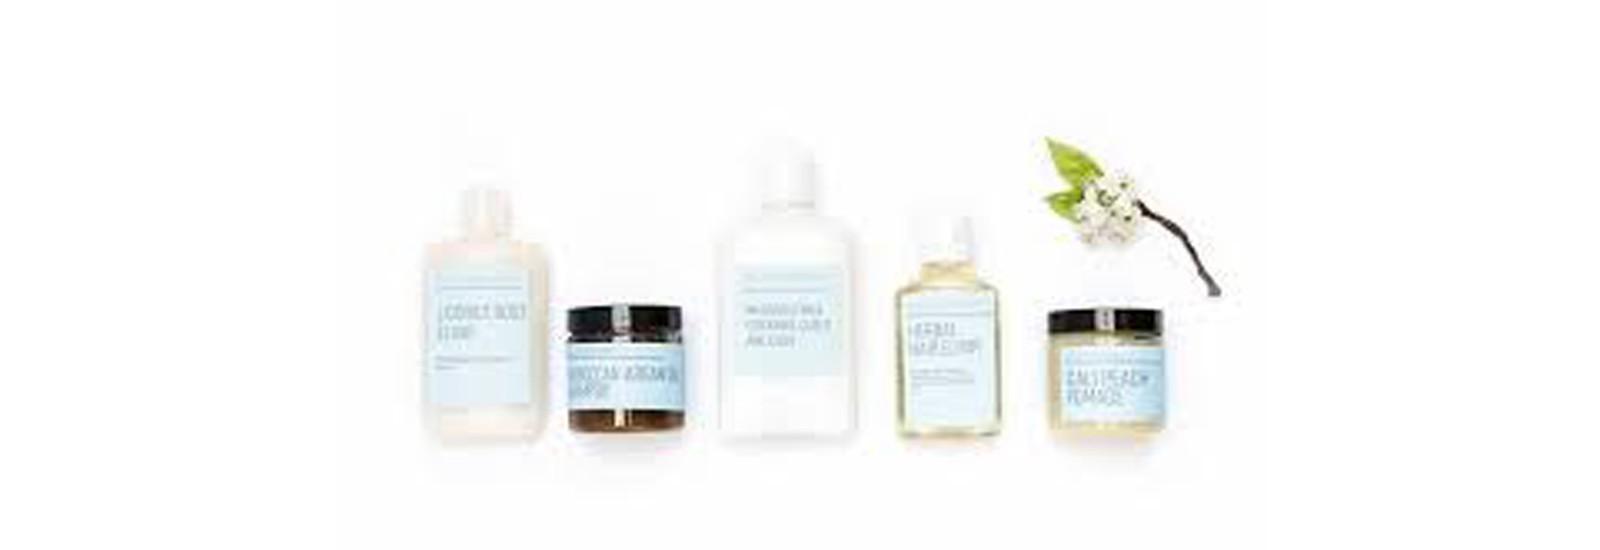 BlackOwnedBusiness BEIJA FLOR NATURALS Products